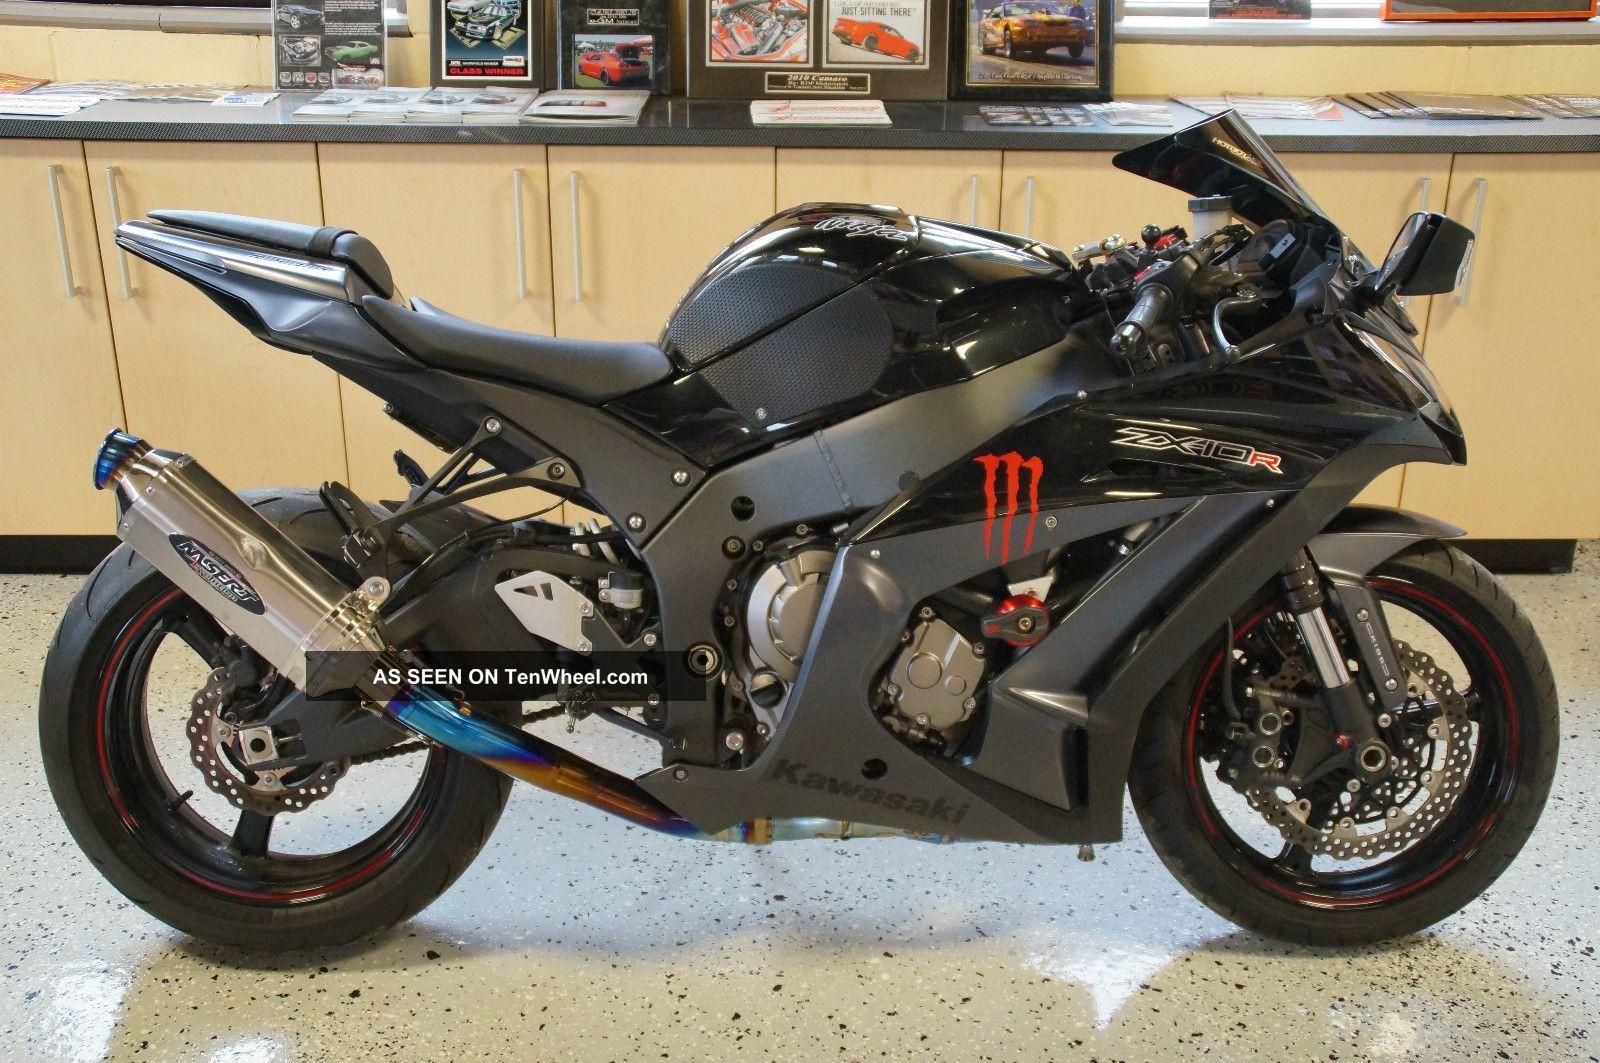 2012 Zx10r Ninja Kawasaki 1000 Black